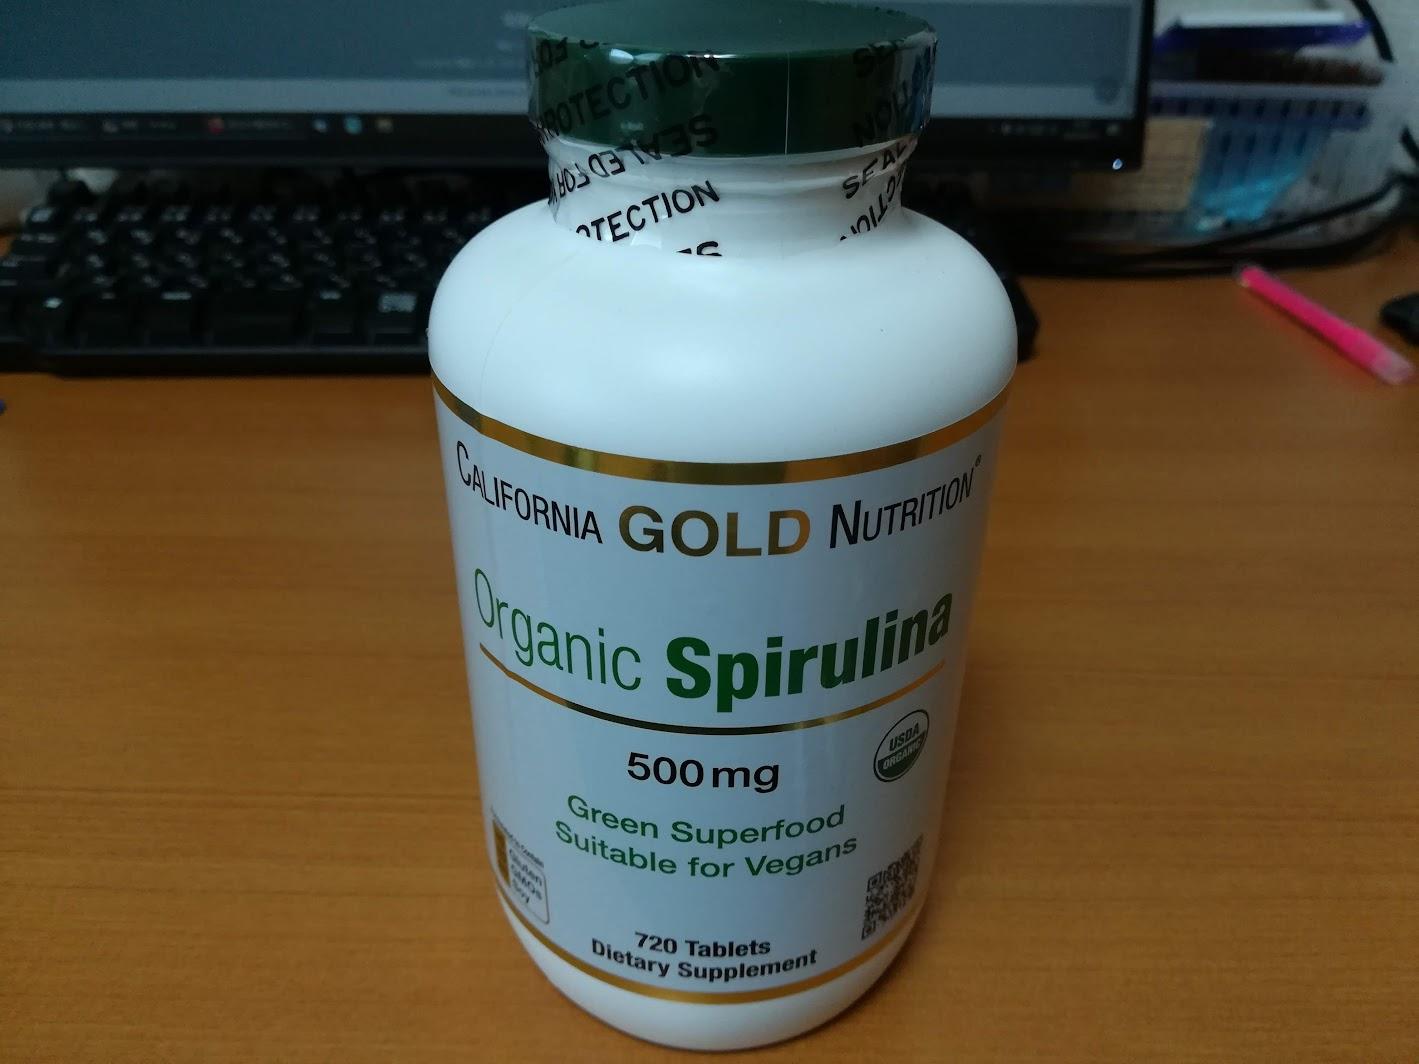 California Gold Nutrition オーガニックのスピルリナ